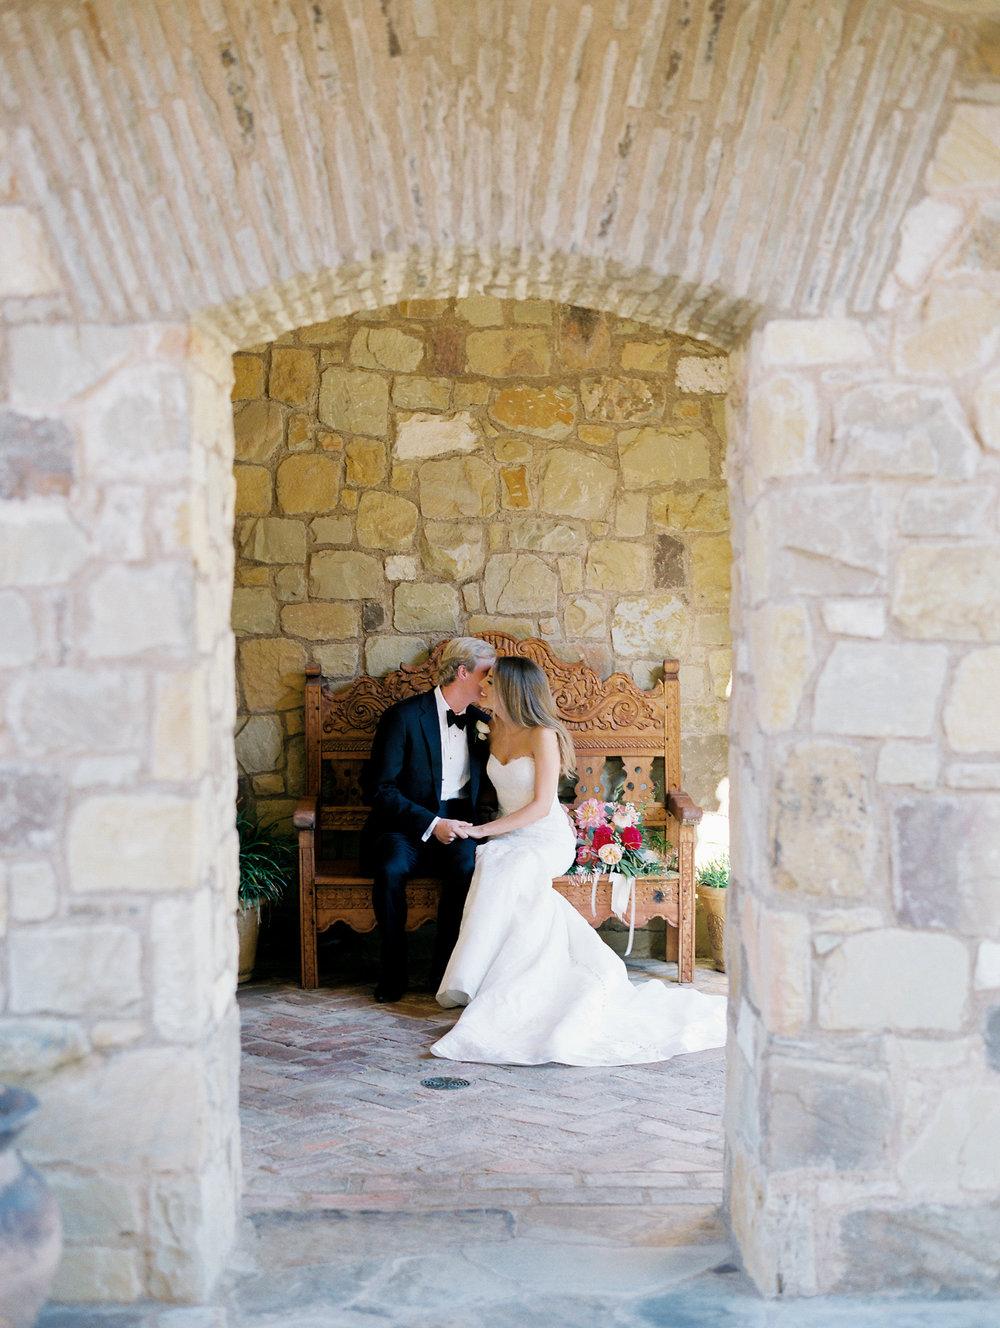 Escondido-Golf_Lake-Club-Hill-Country-Houston-Wedding-Photographer-Best-Top-Luxury-Destination-Engagements-Portrait-Austin-Photography-7.jpg